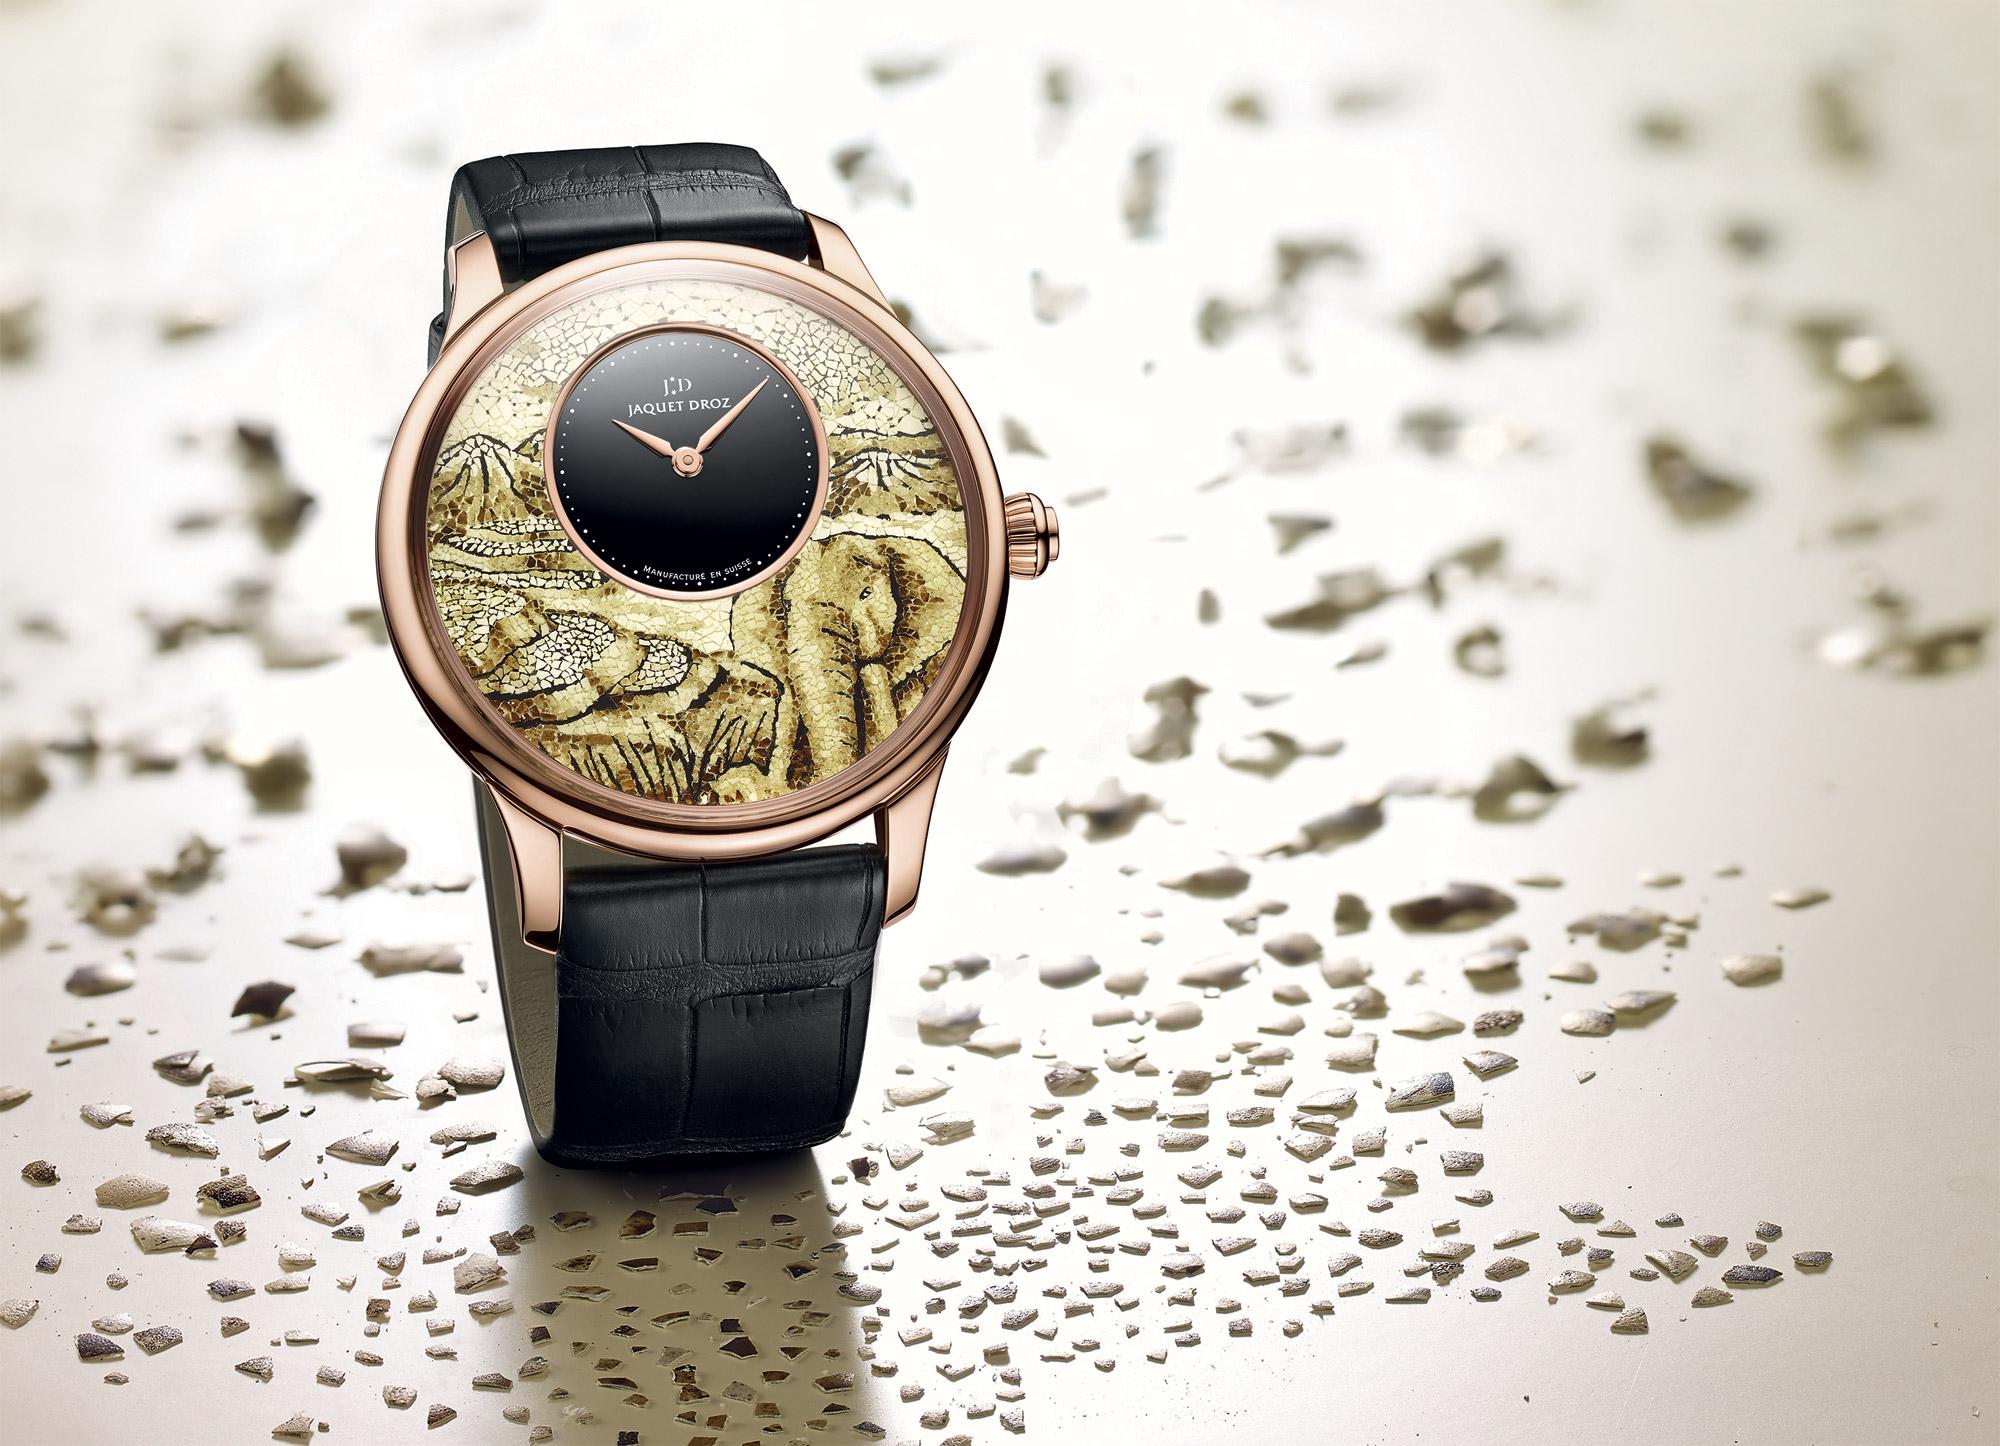 The Jaquet Droz Petite Heure Minute Mosaic Elephant